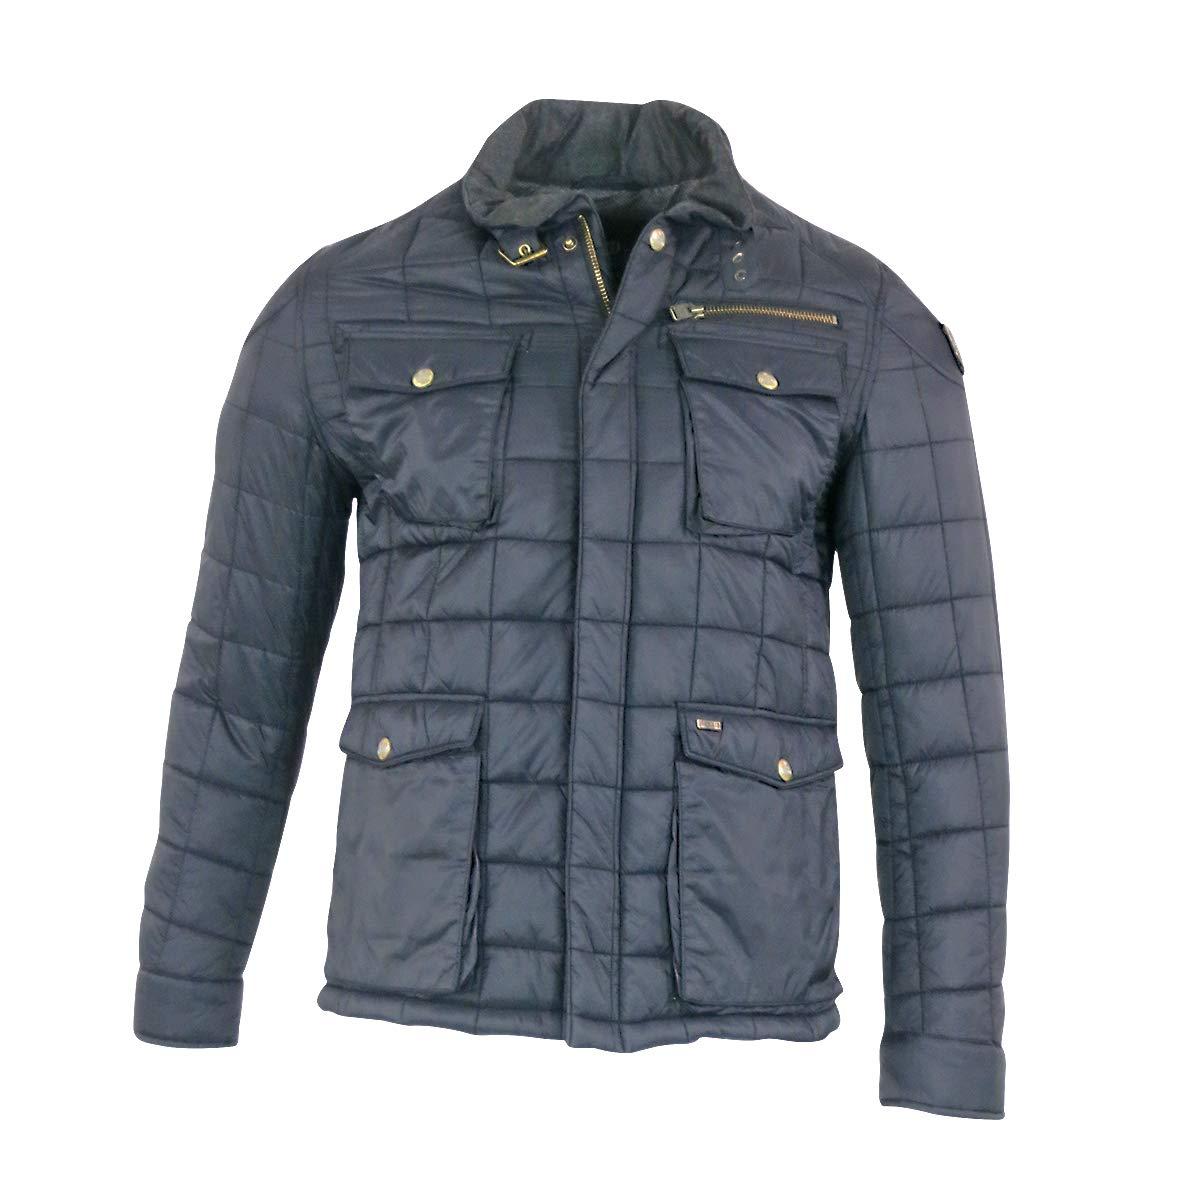 Vanguard Herren Lederjacke Bikerjacke Blau Petrol Jacke für Männer